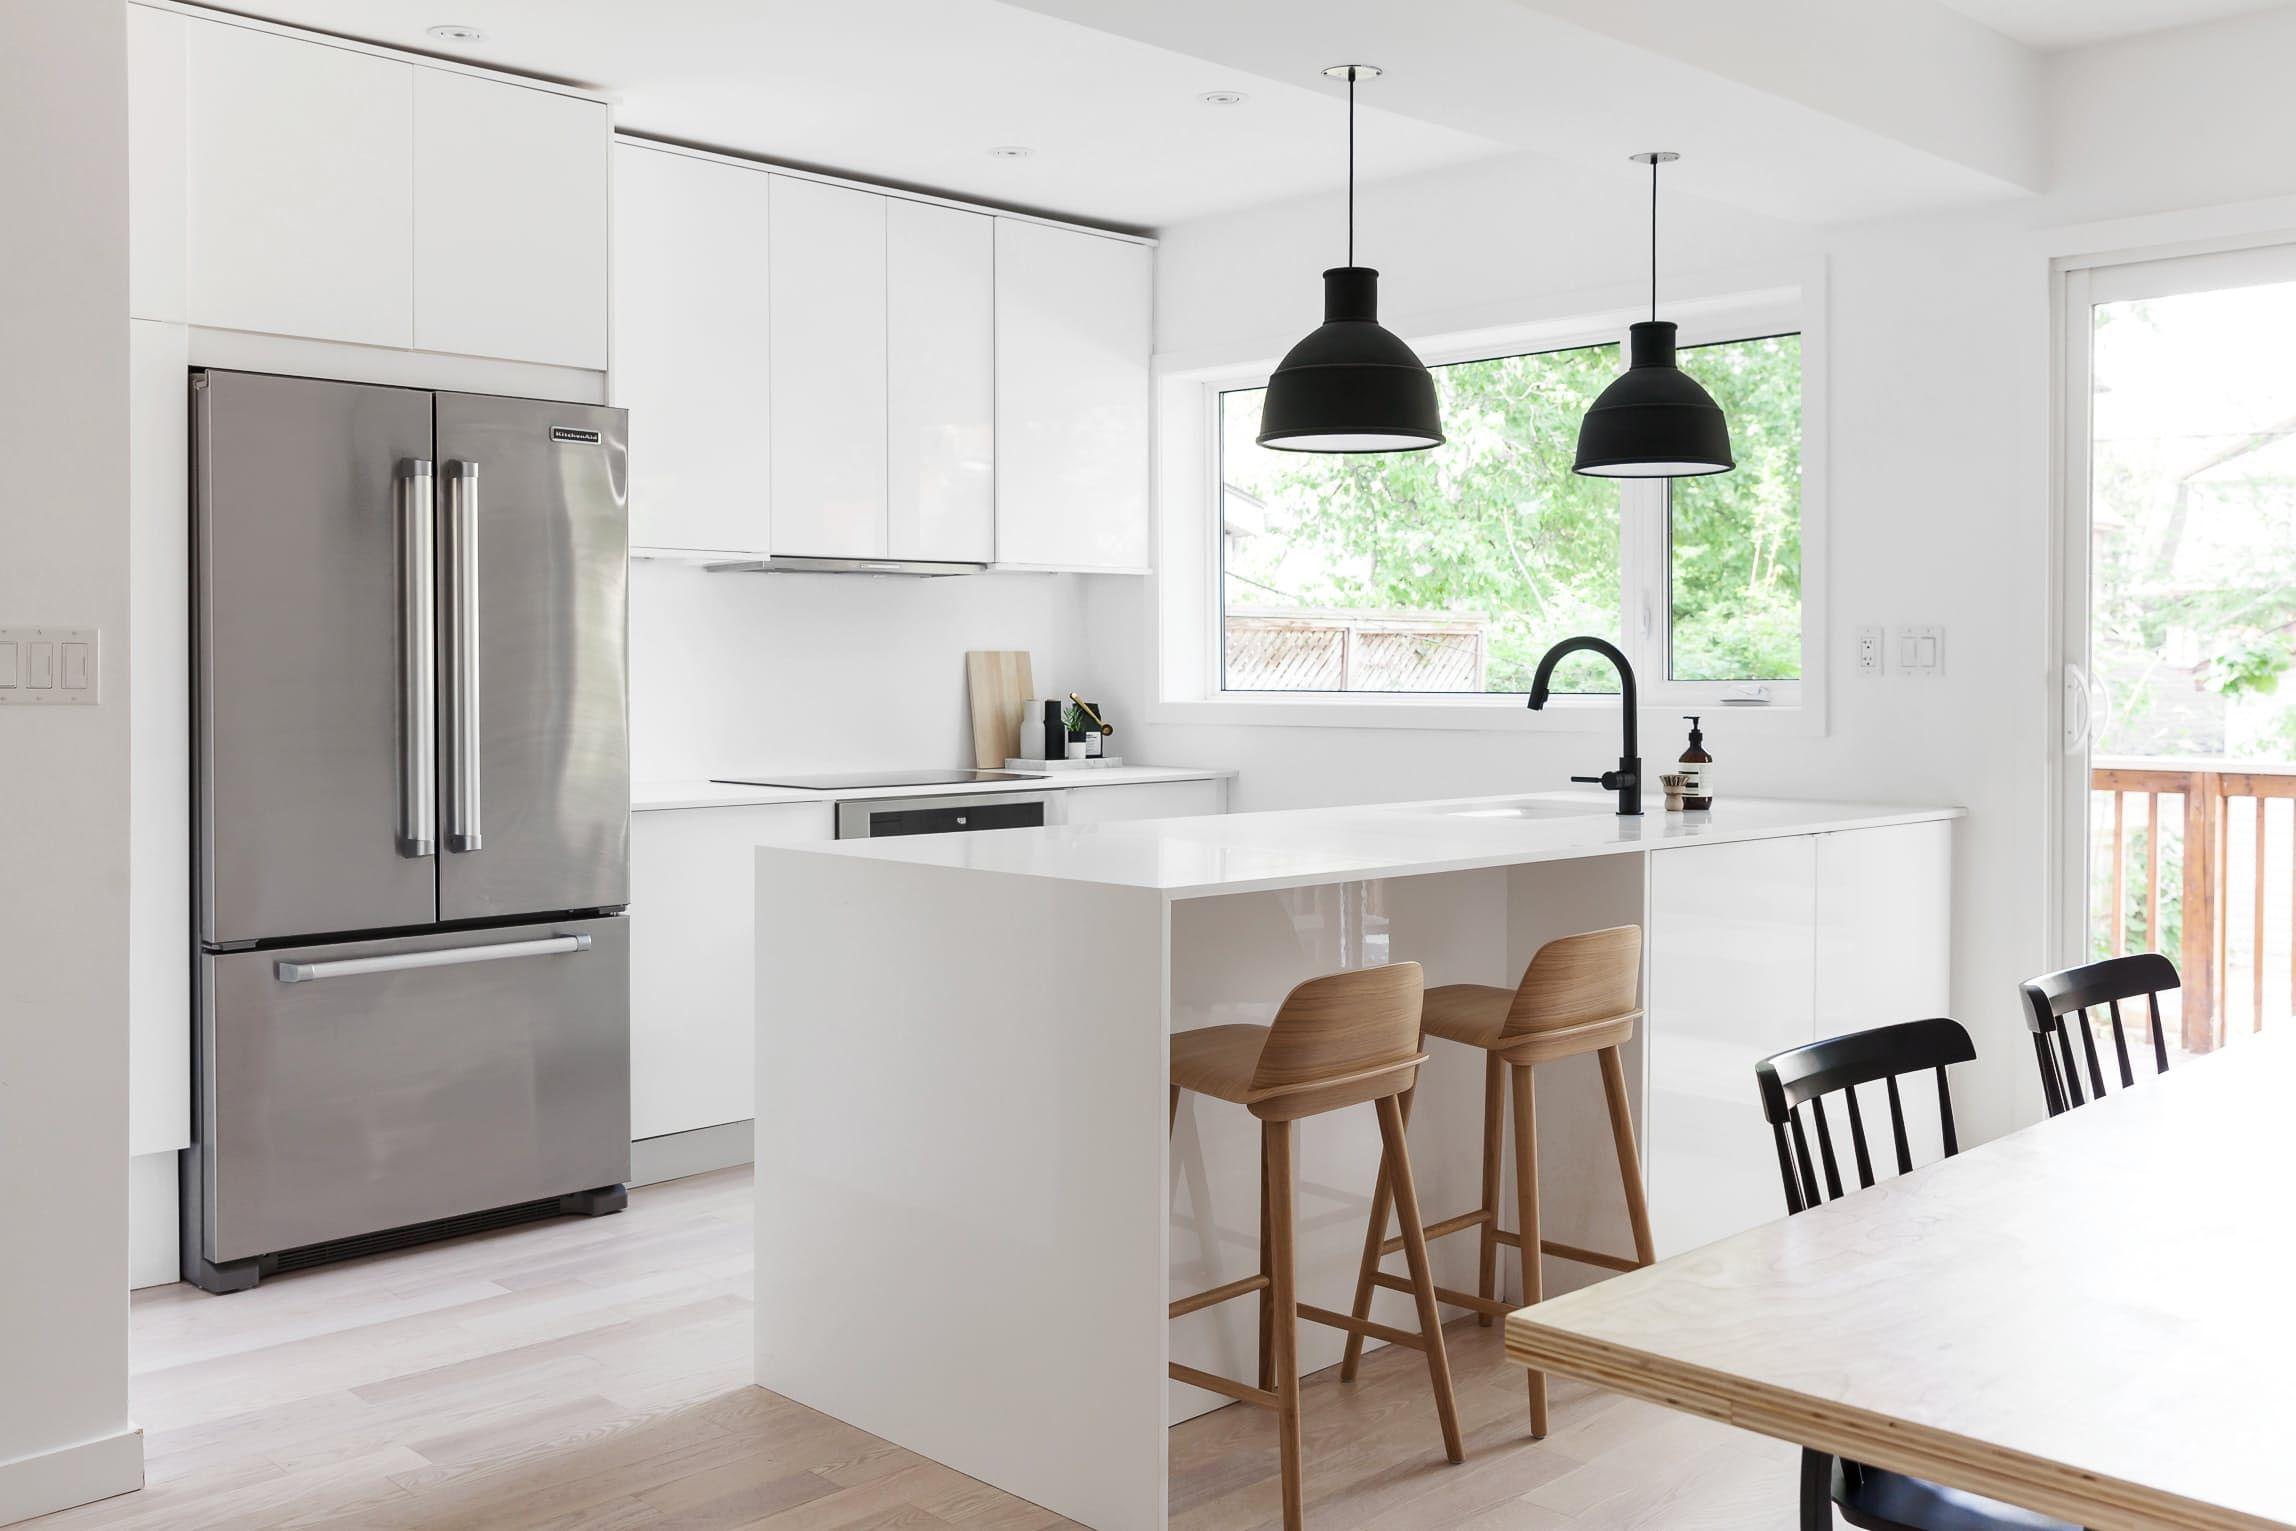 Gallery of kitchen island breakfast bar ideas & inspiration